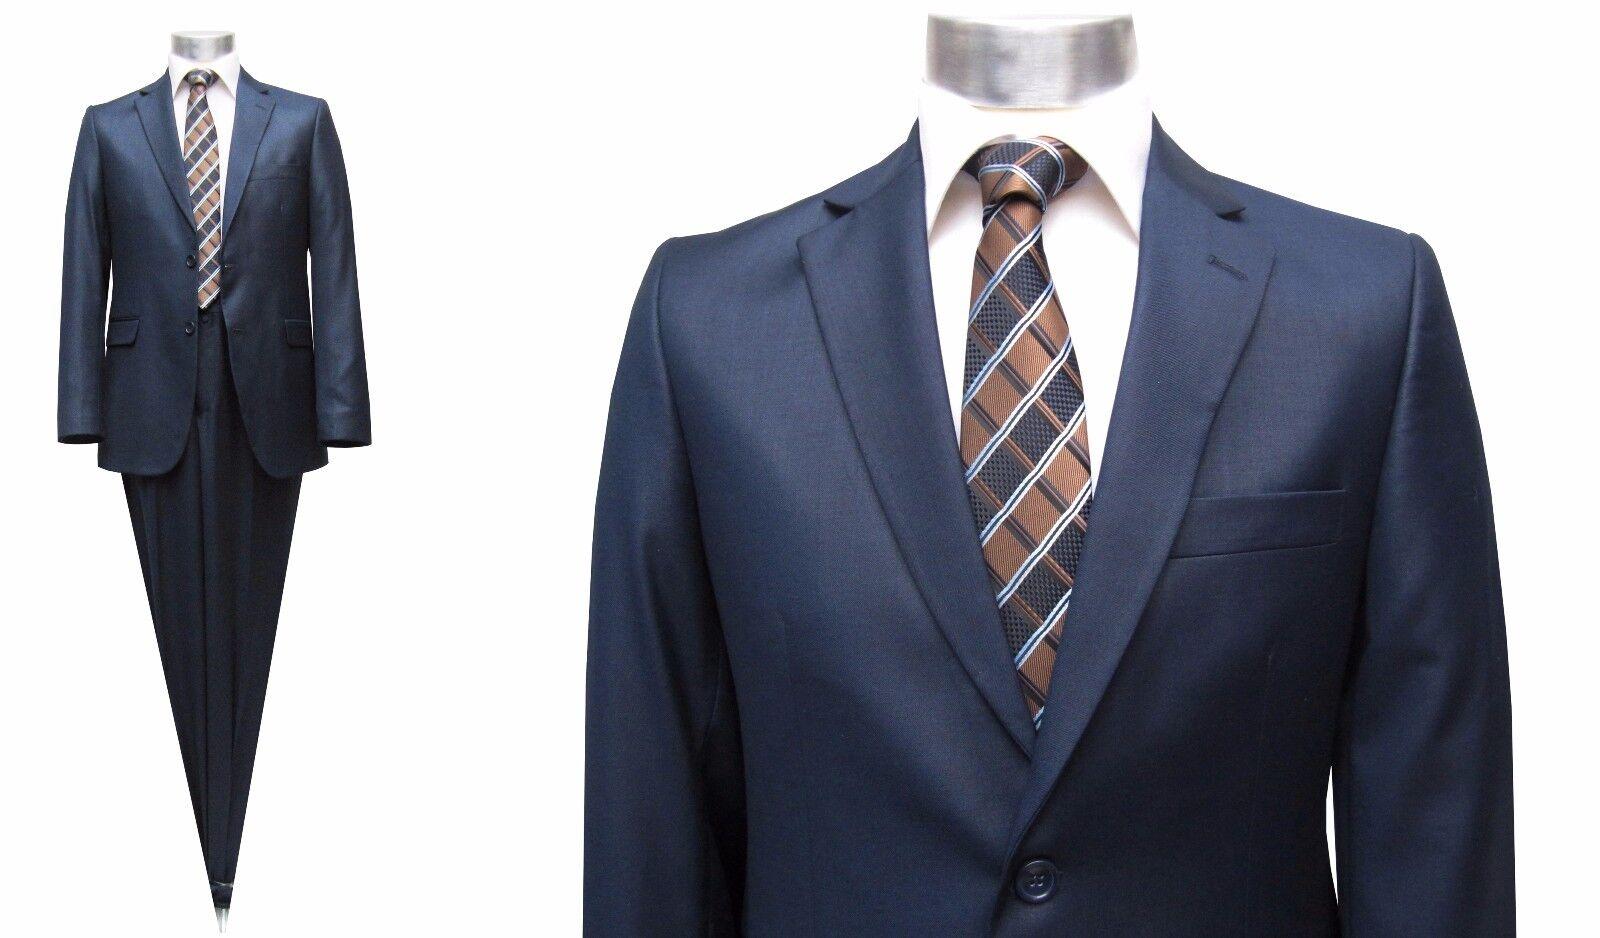 Moderne Herren Anzug Gr.46 Blau marine